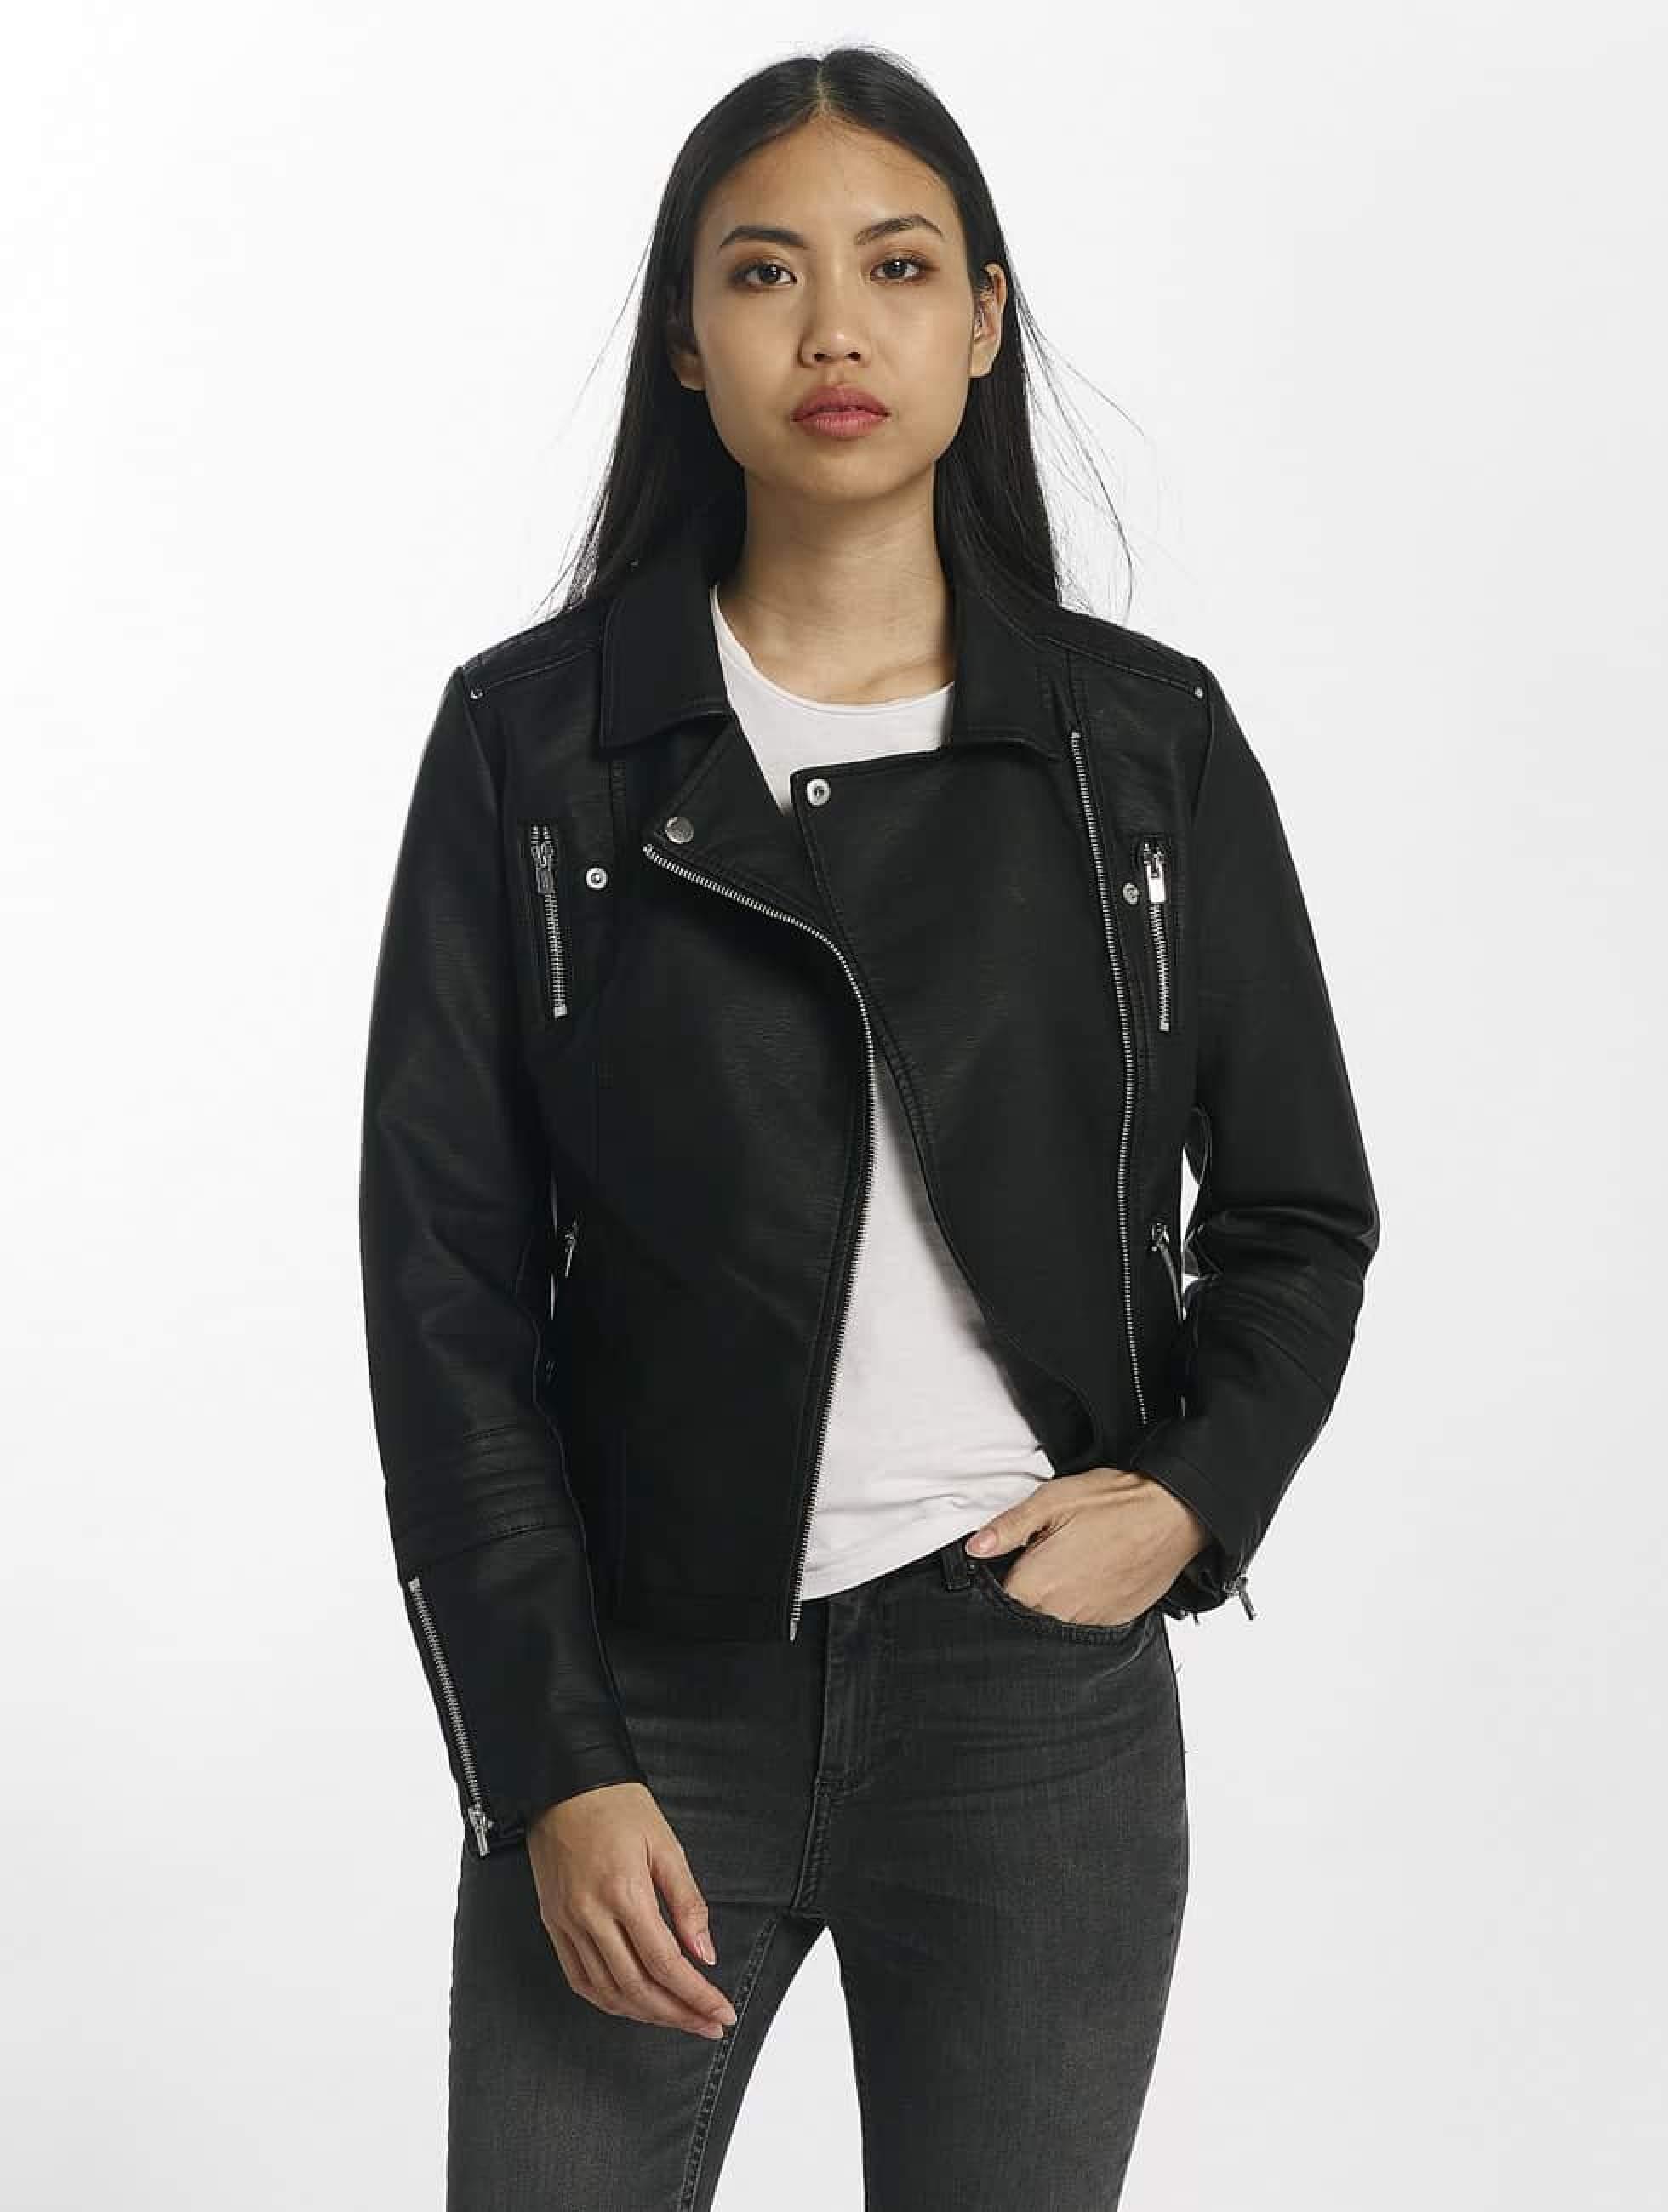 Turnschuhe Fabrik authentisch Super Qualität Only onlGemma Faux Leather Biker Jacket Black